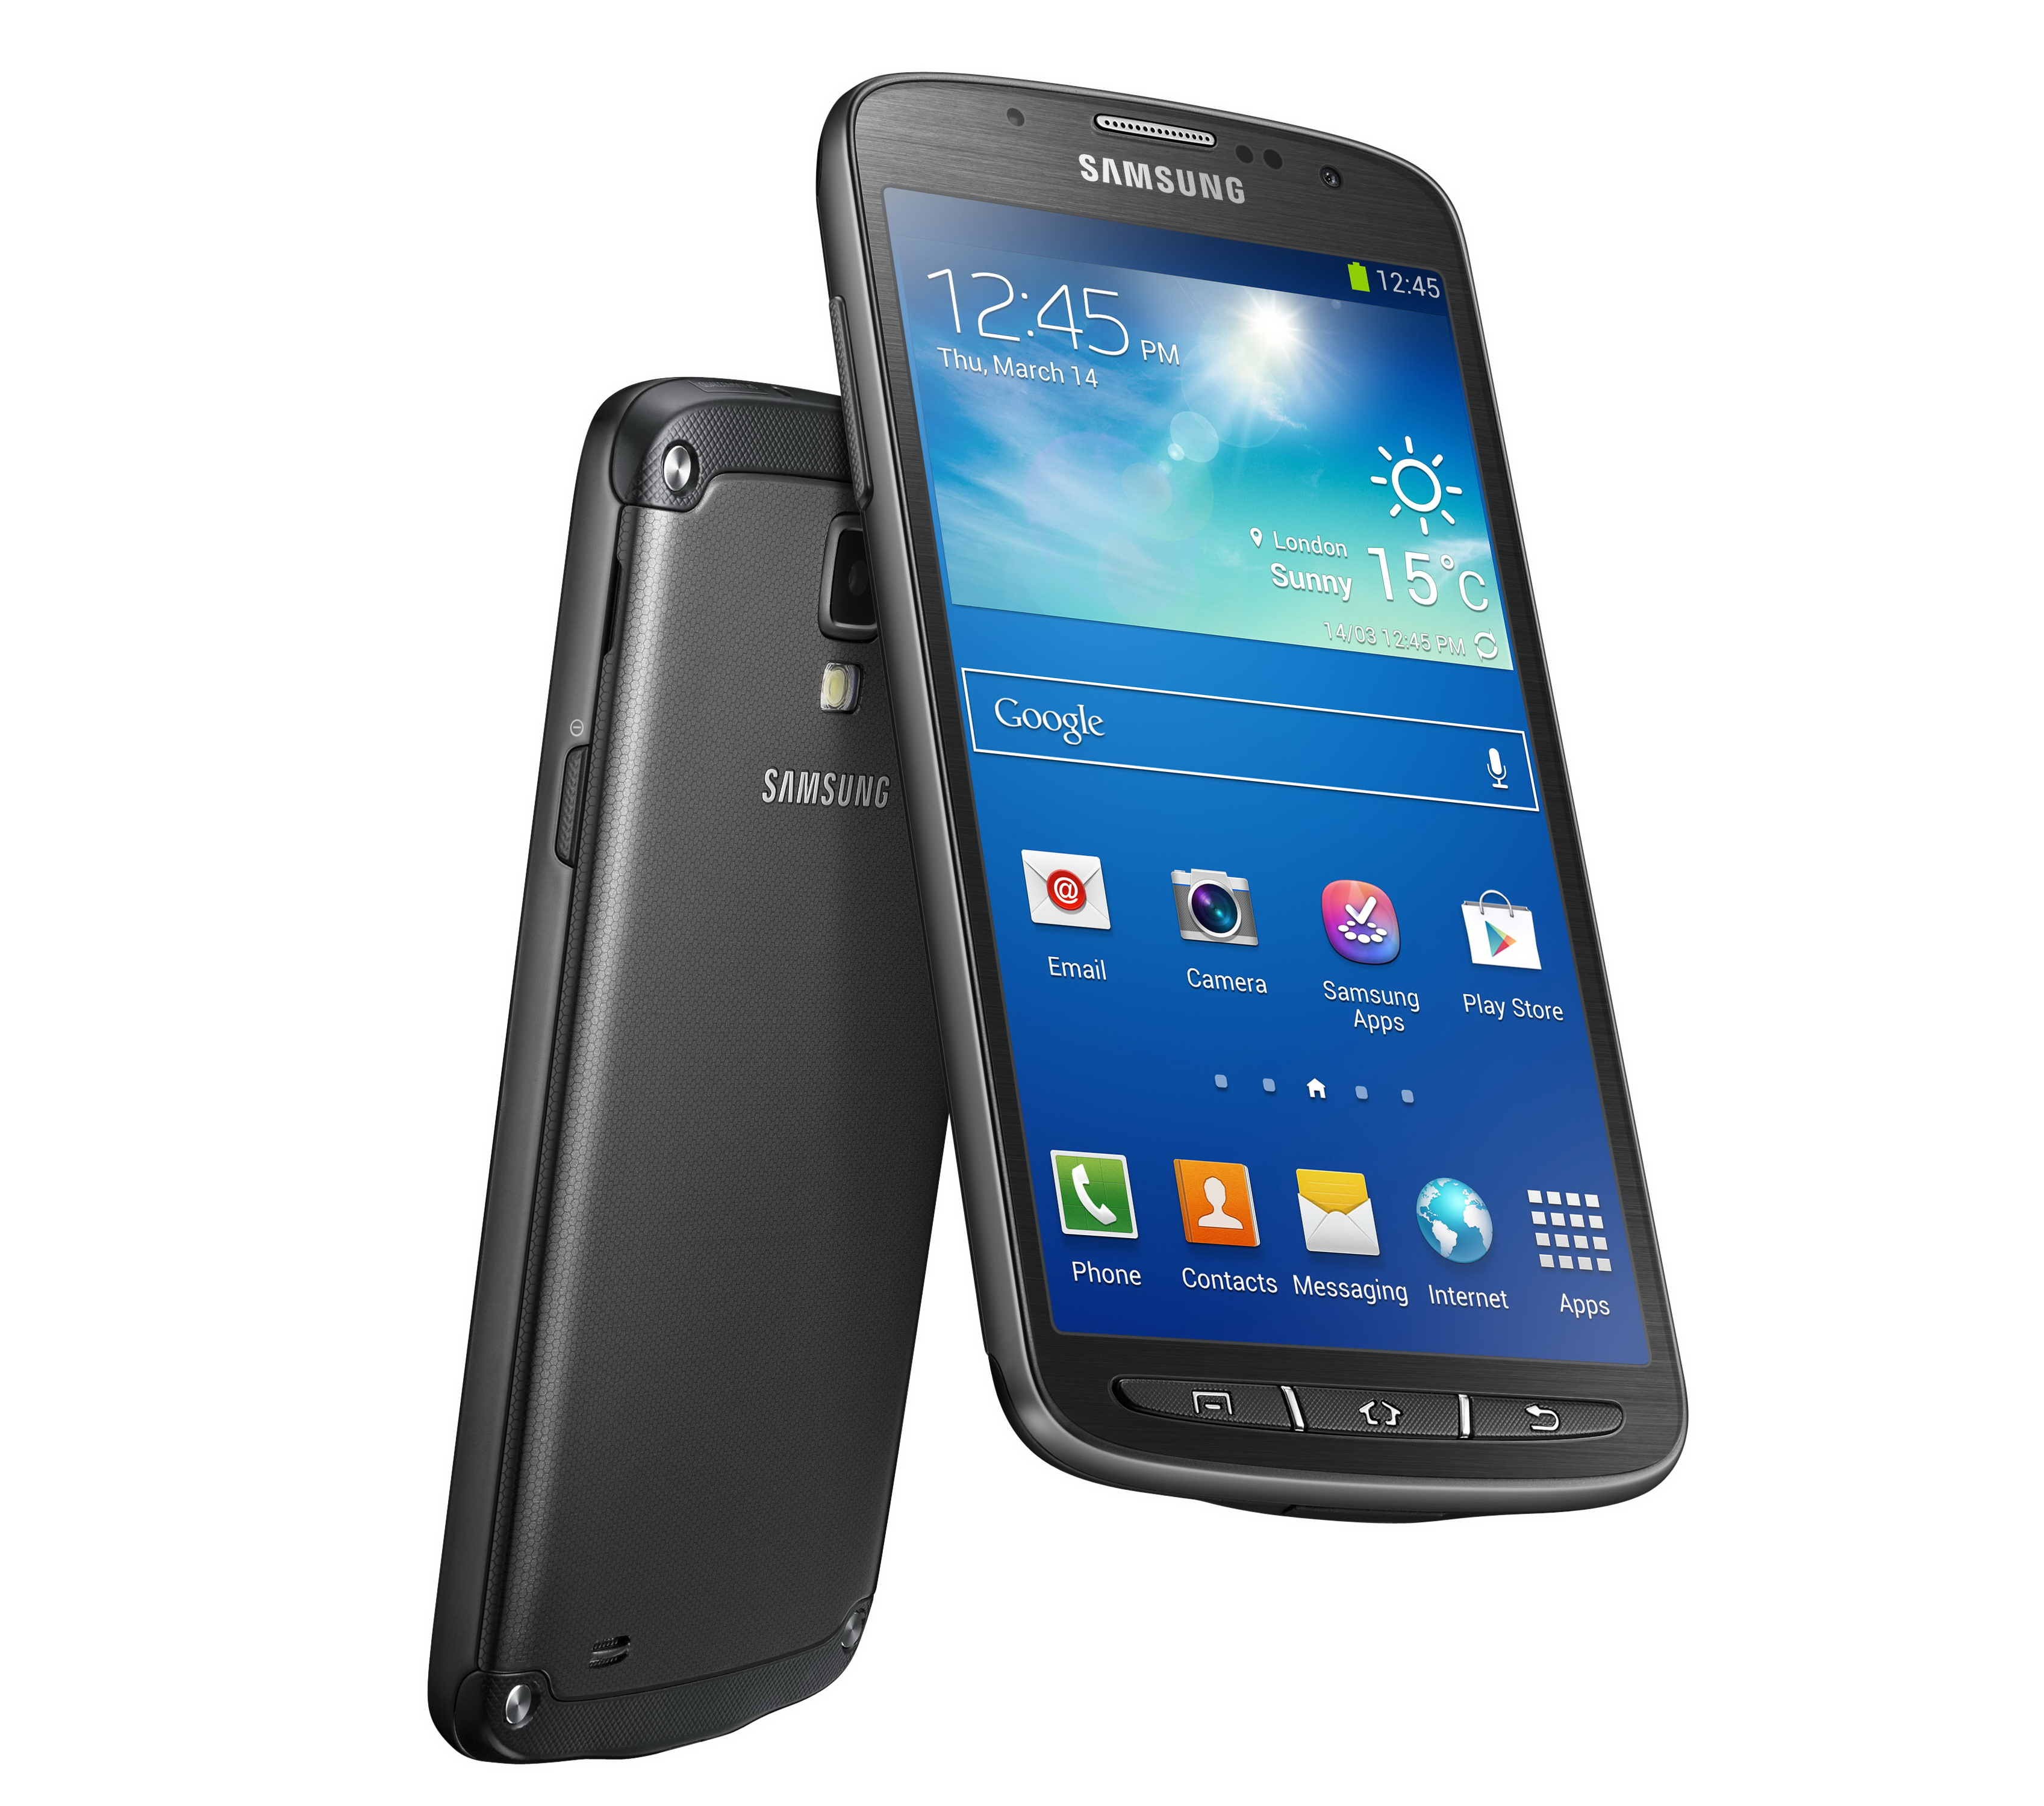 Notebook samsung galaxy s4 - Samsung Galaxy S4 Active